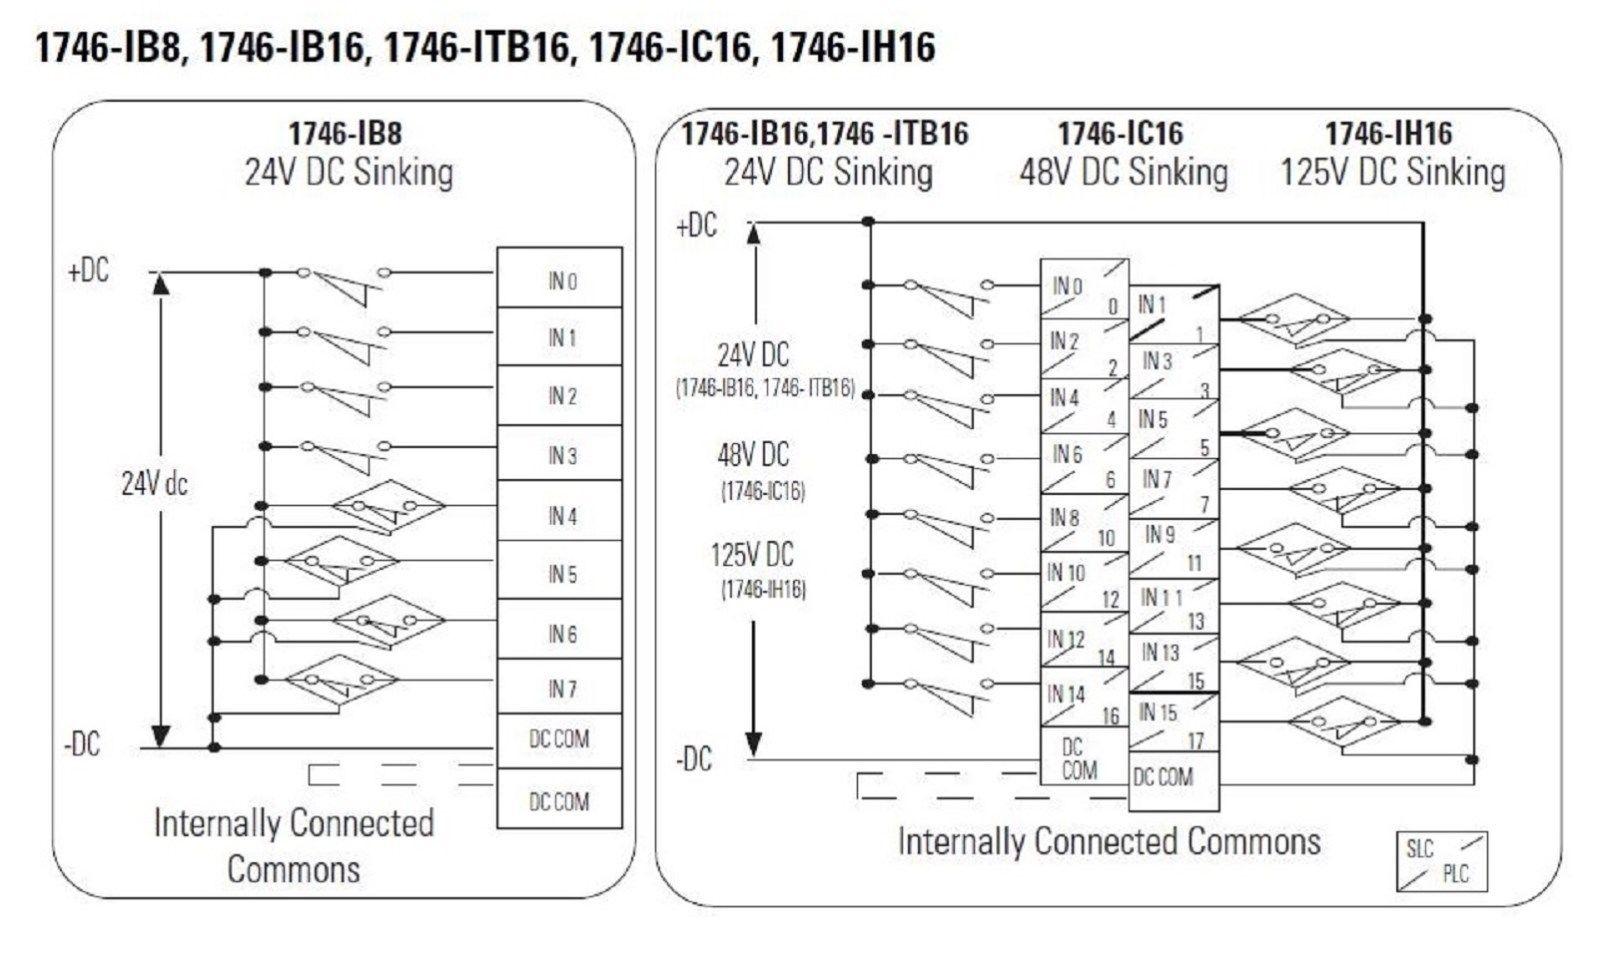 hight resolution of 1746 ib16 wiring diagram